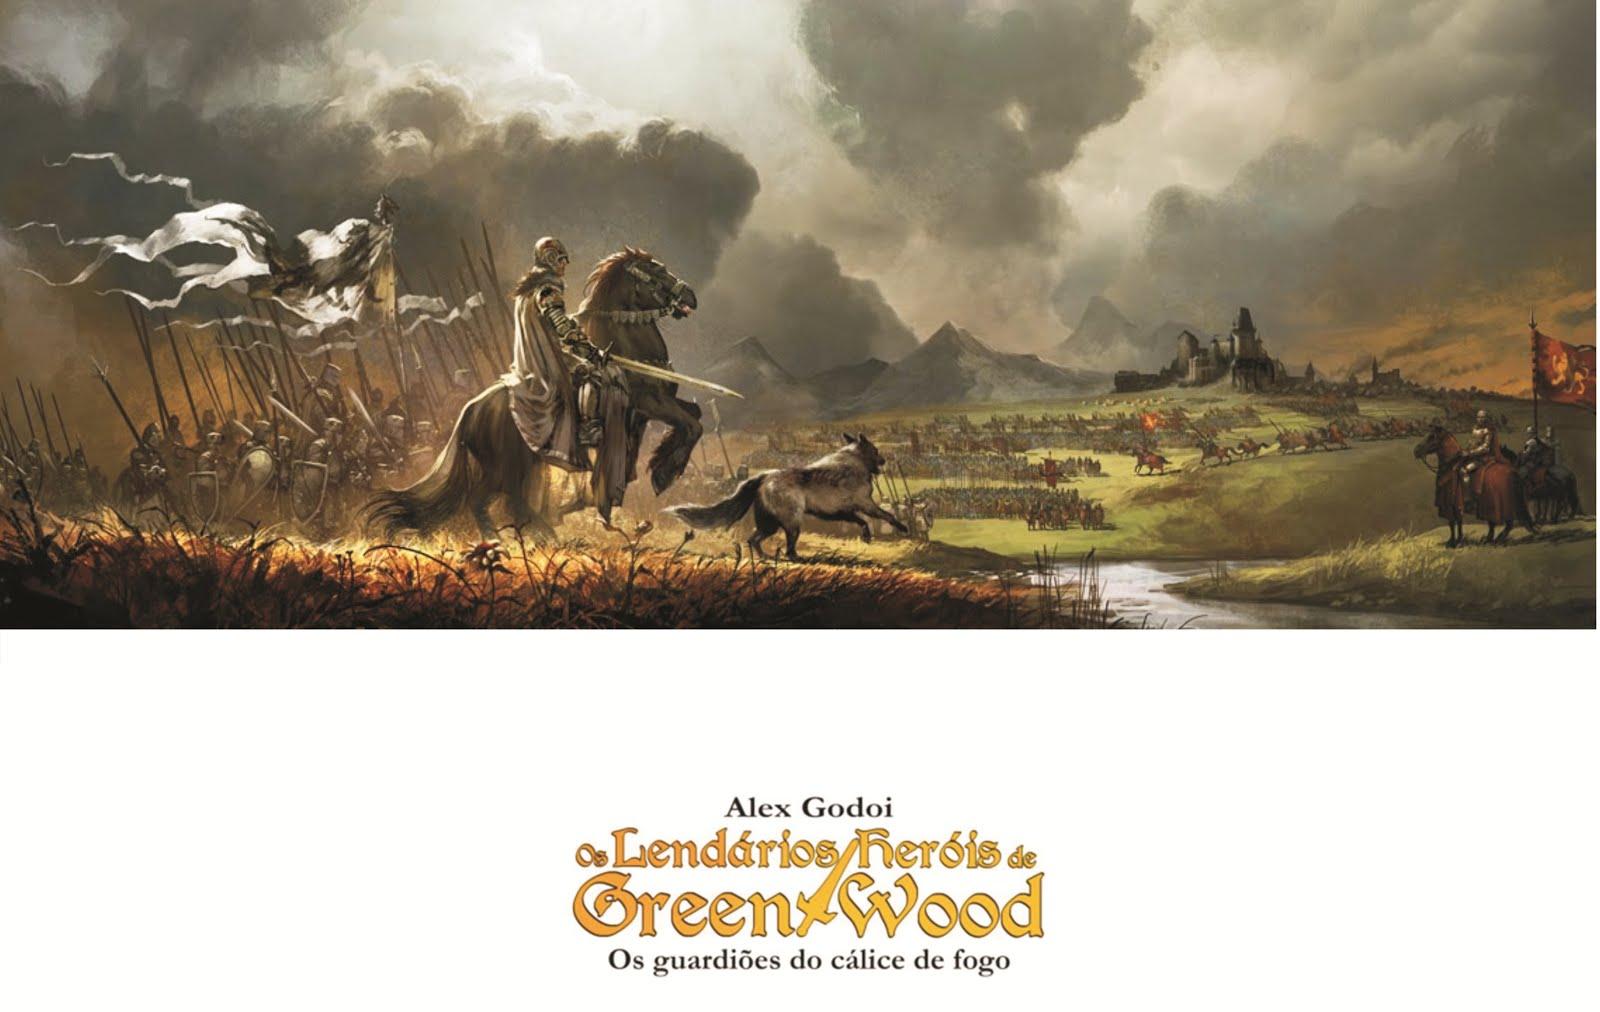 Cavaleiros de Green wood